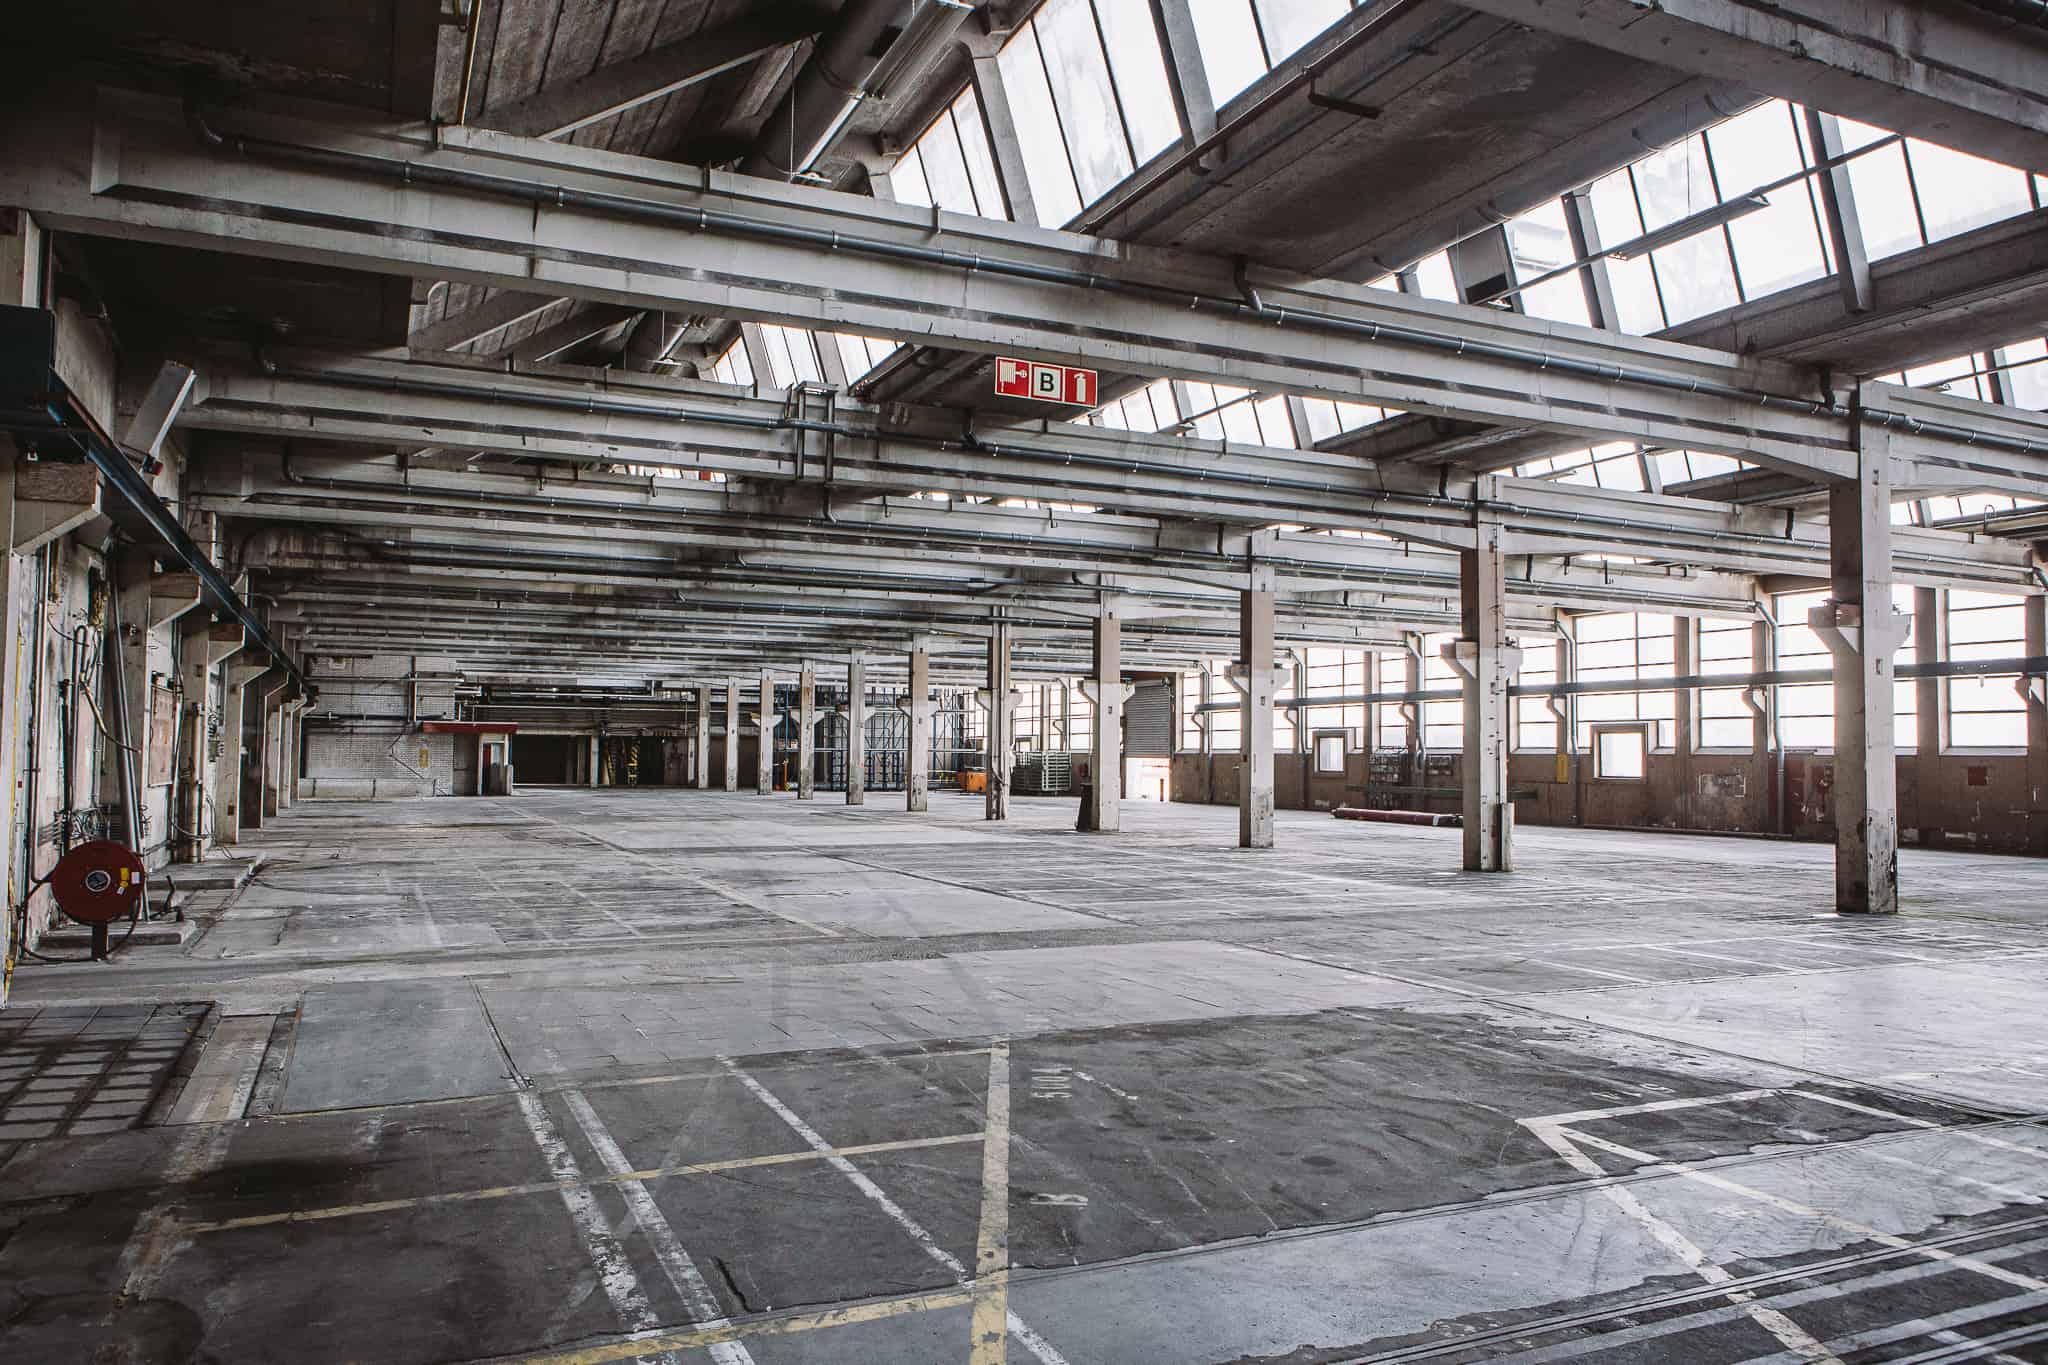 EKI_Nijmegen_18 - papierfabriek - industreel - locatie